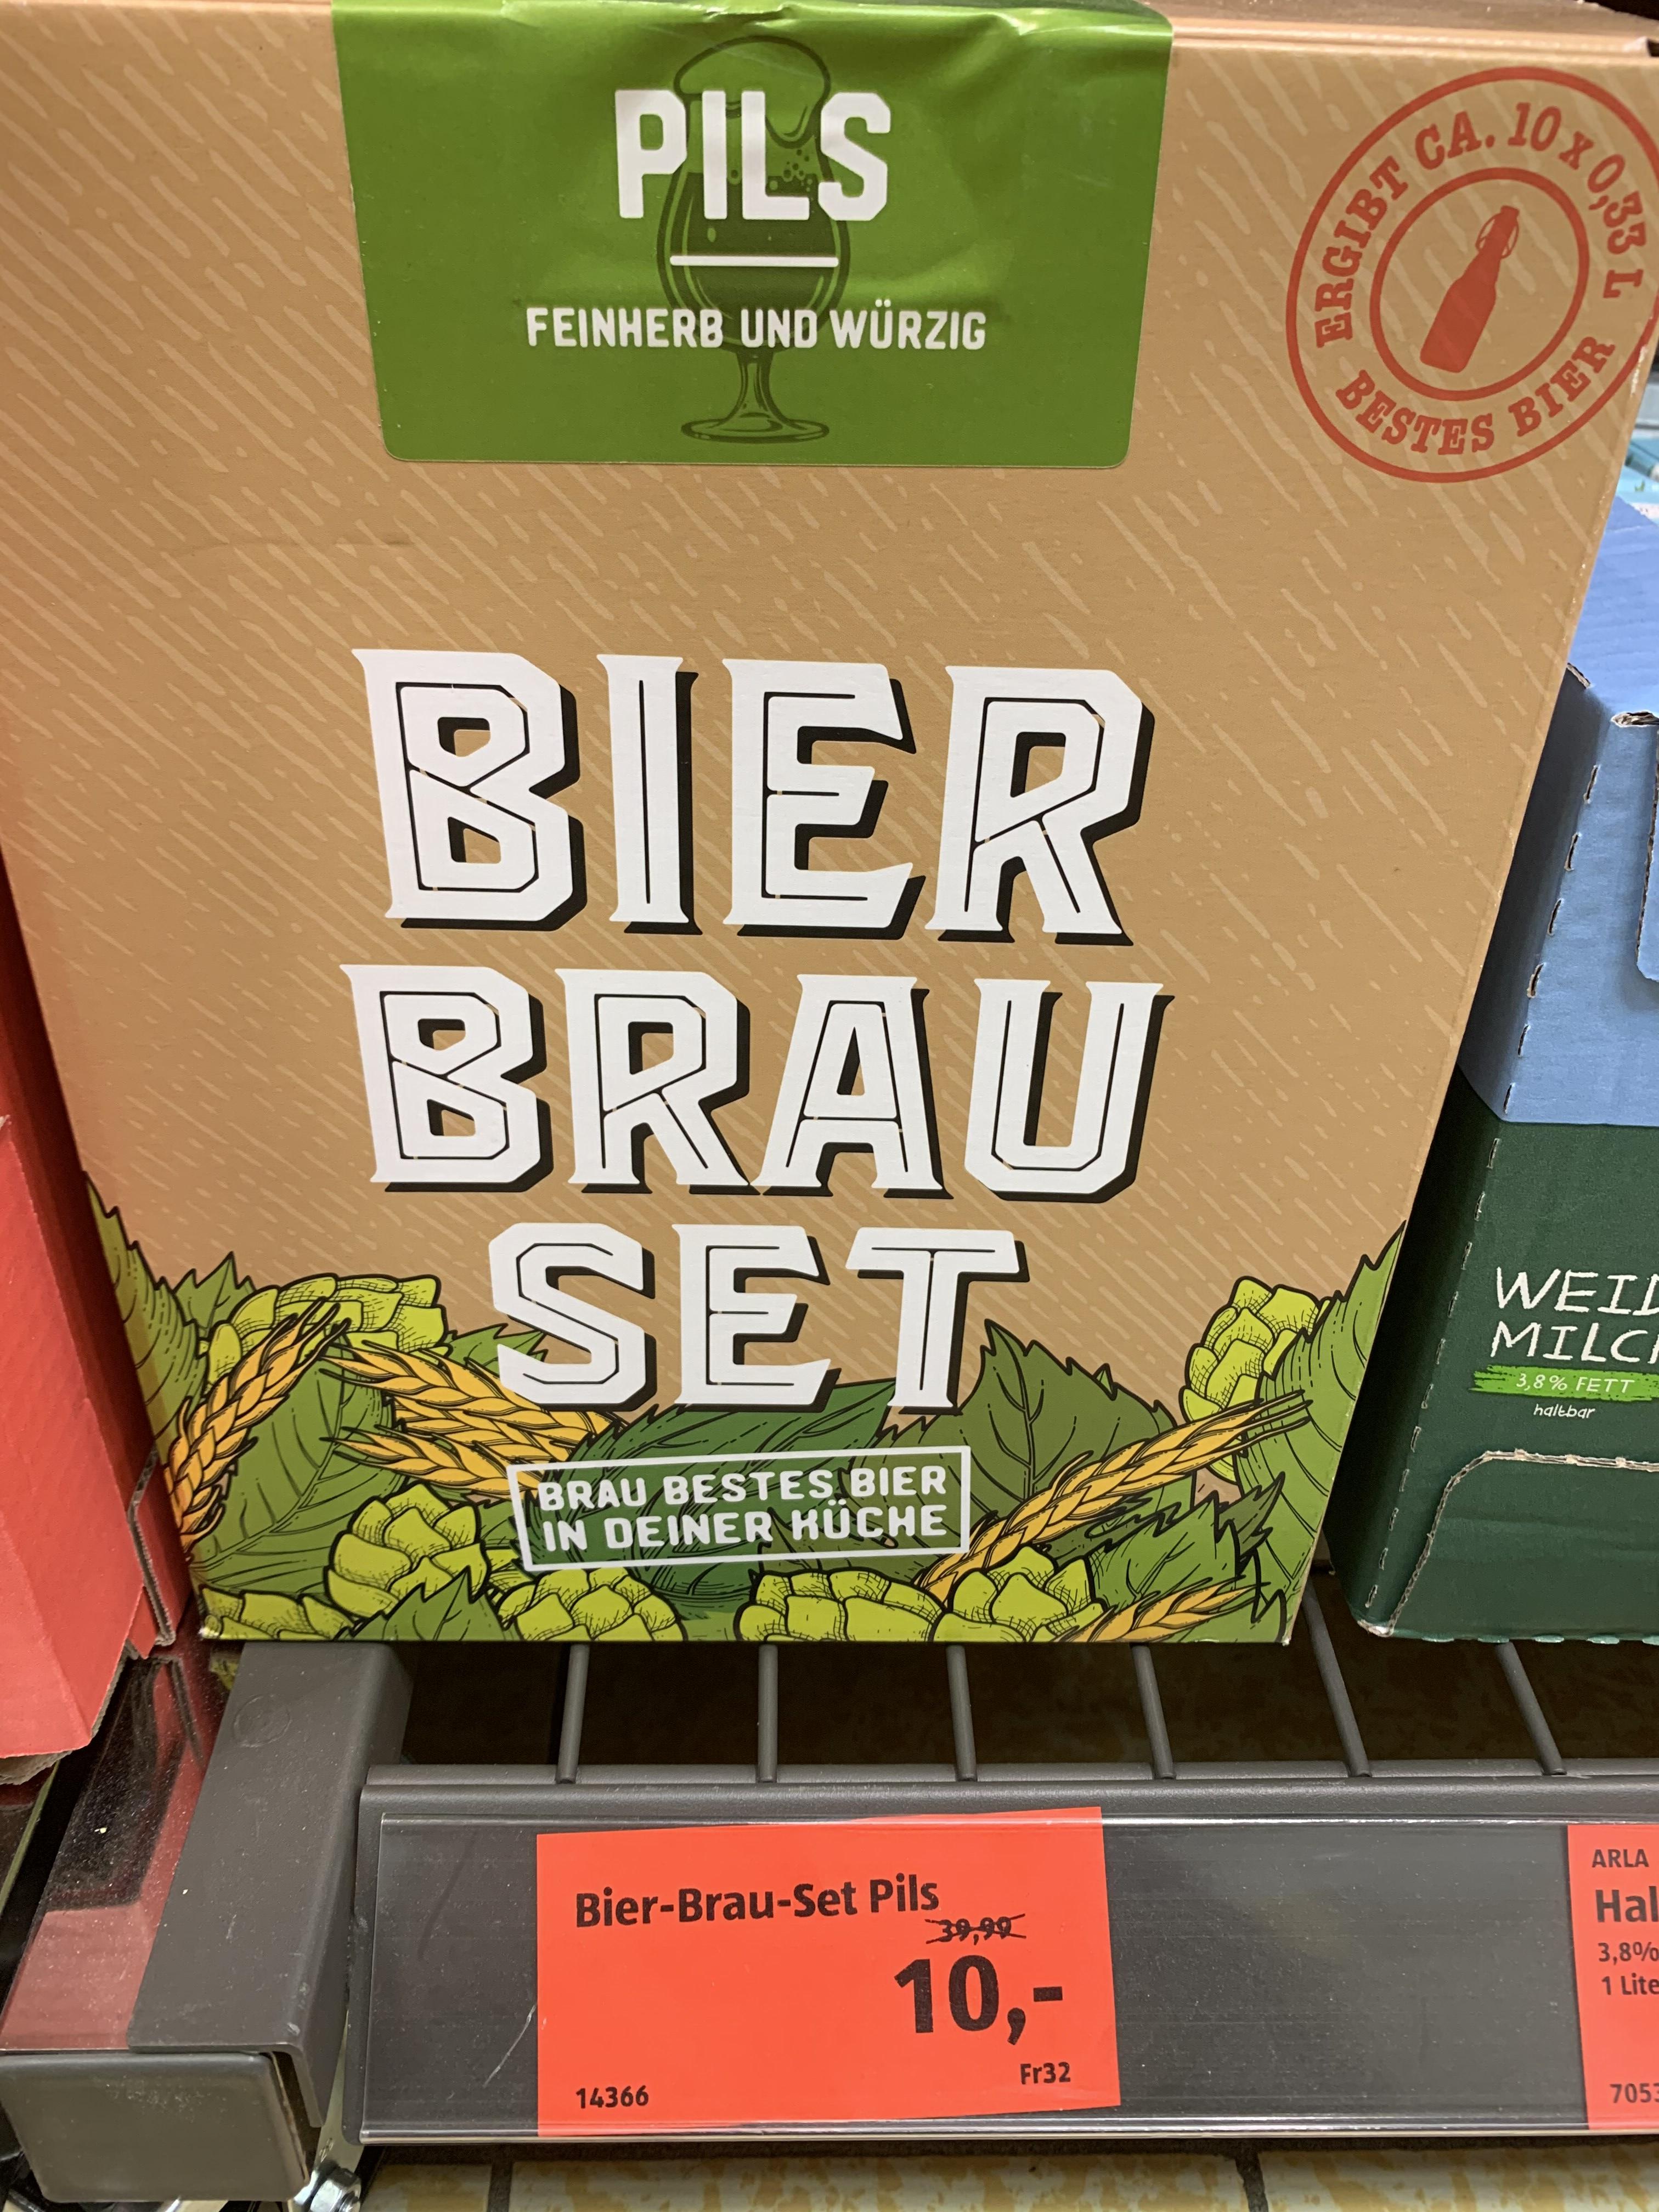 Bier-Brau-Set Pils (Lokal)